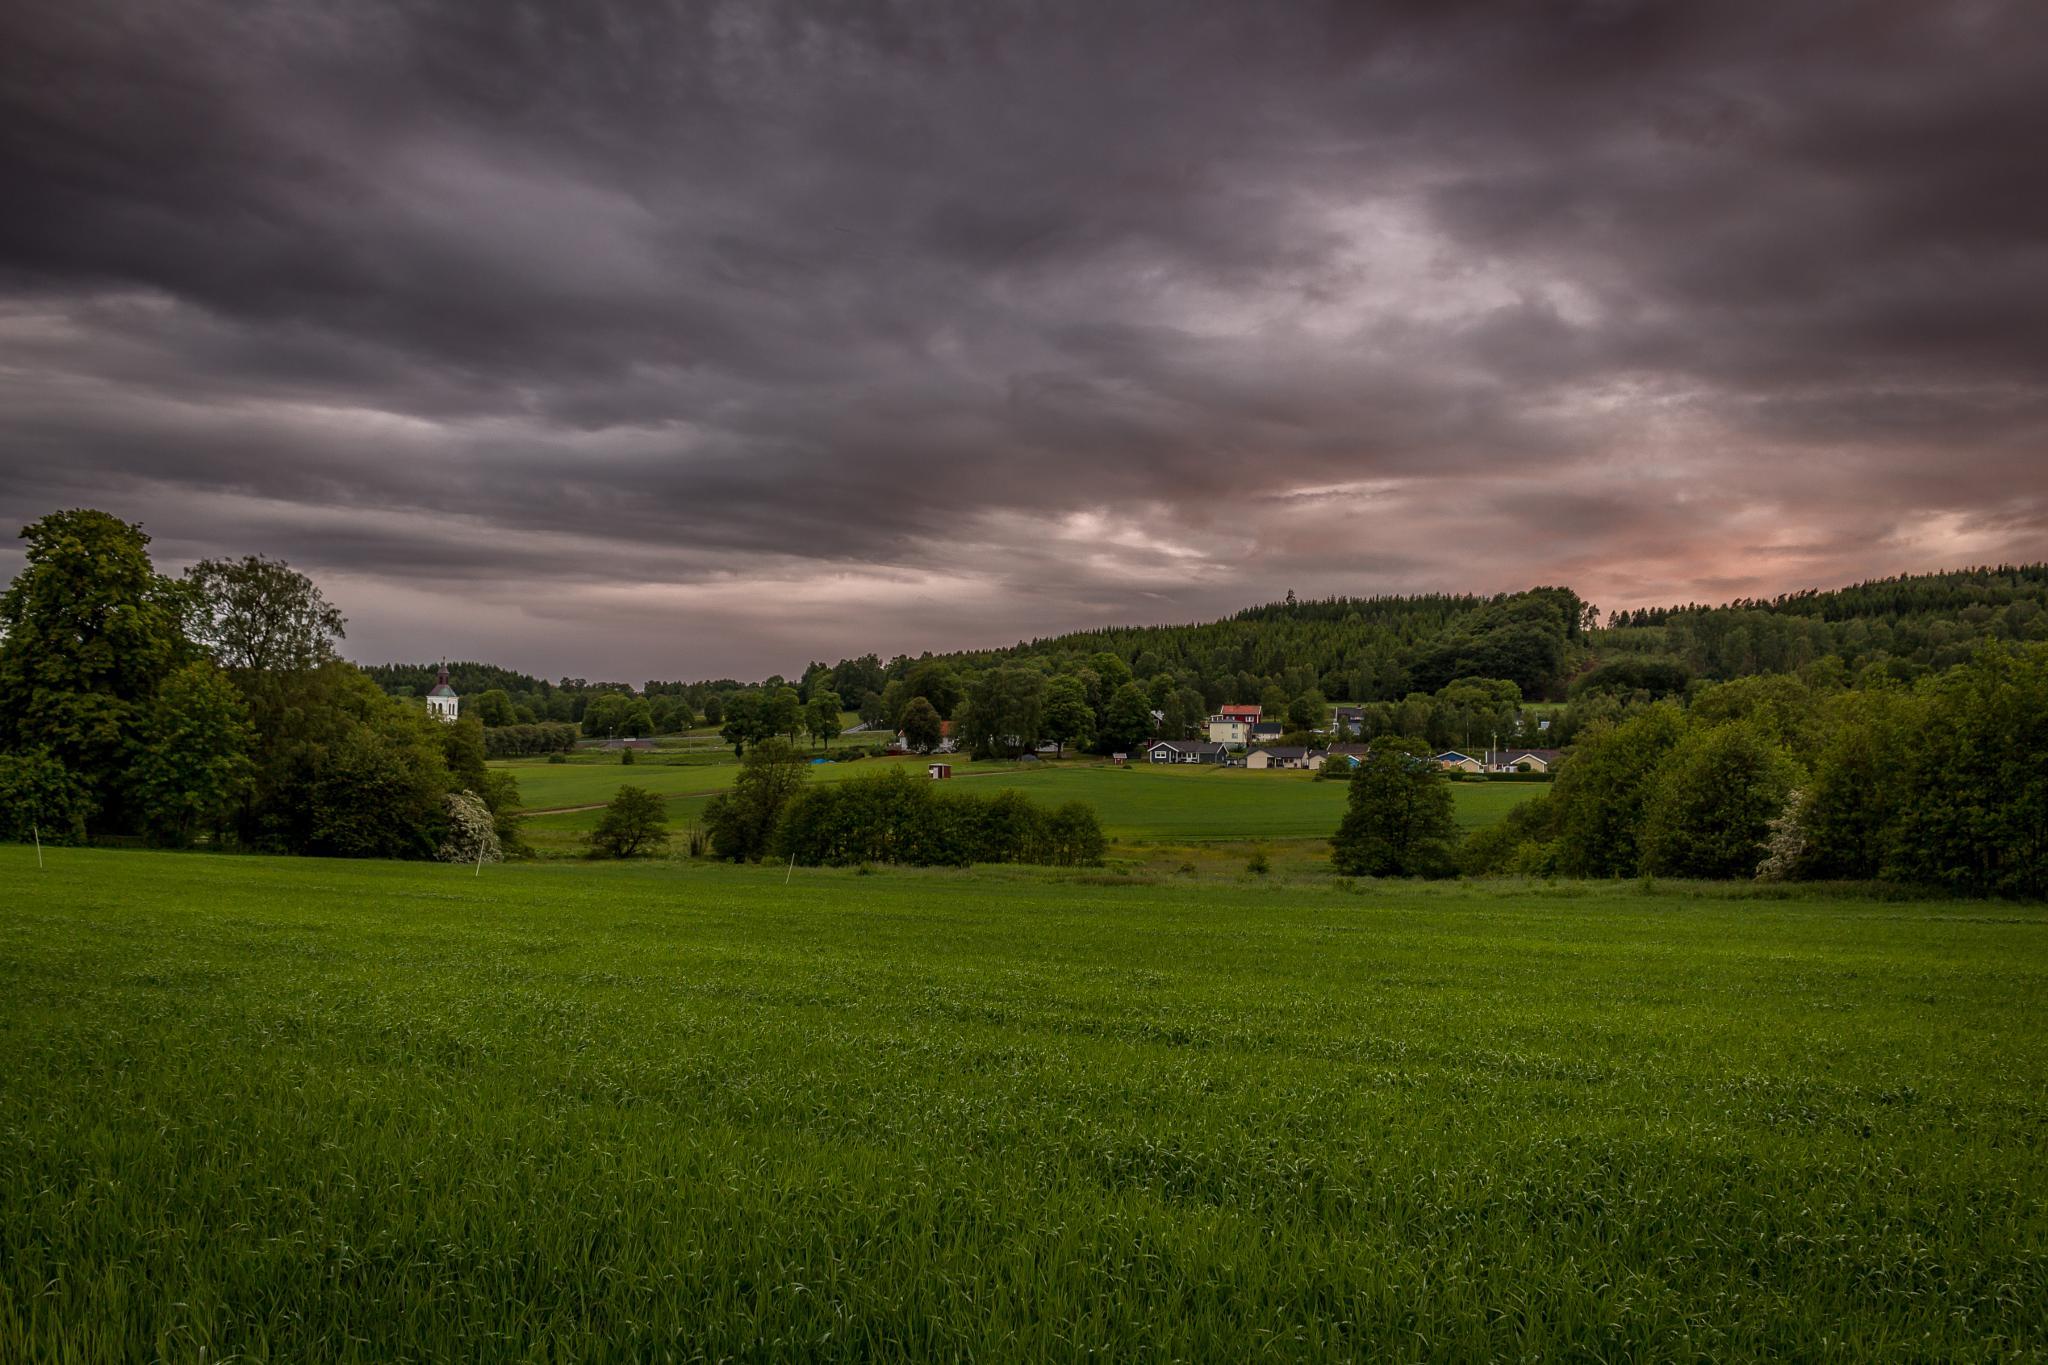 Dusk at the village. by Magnus Bengtsson